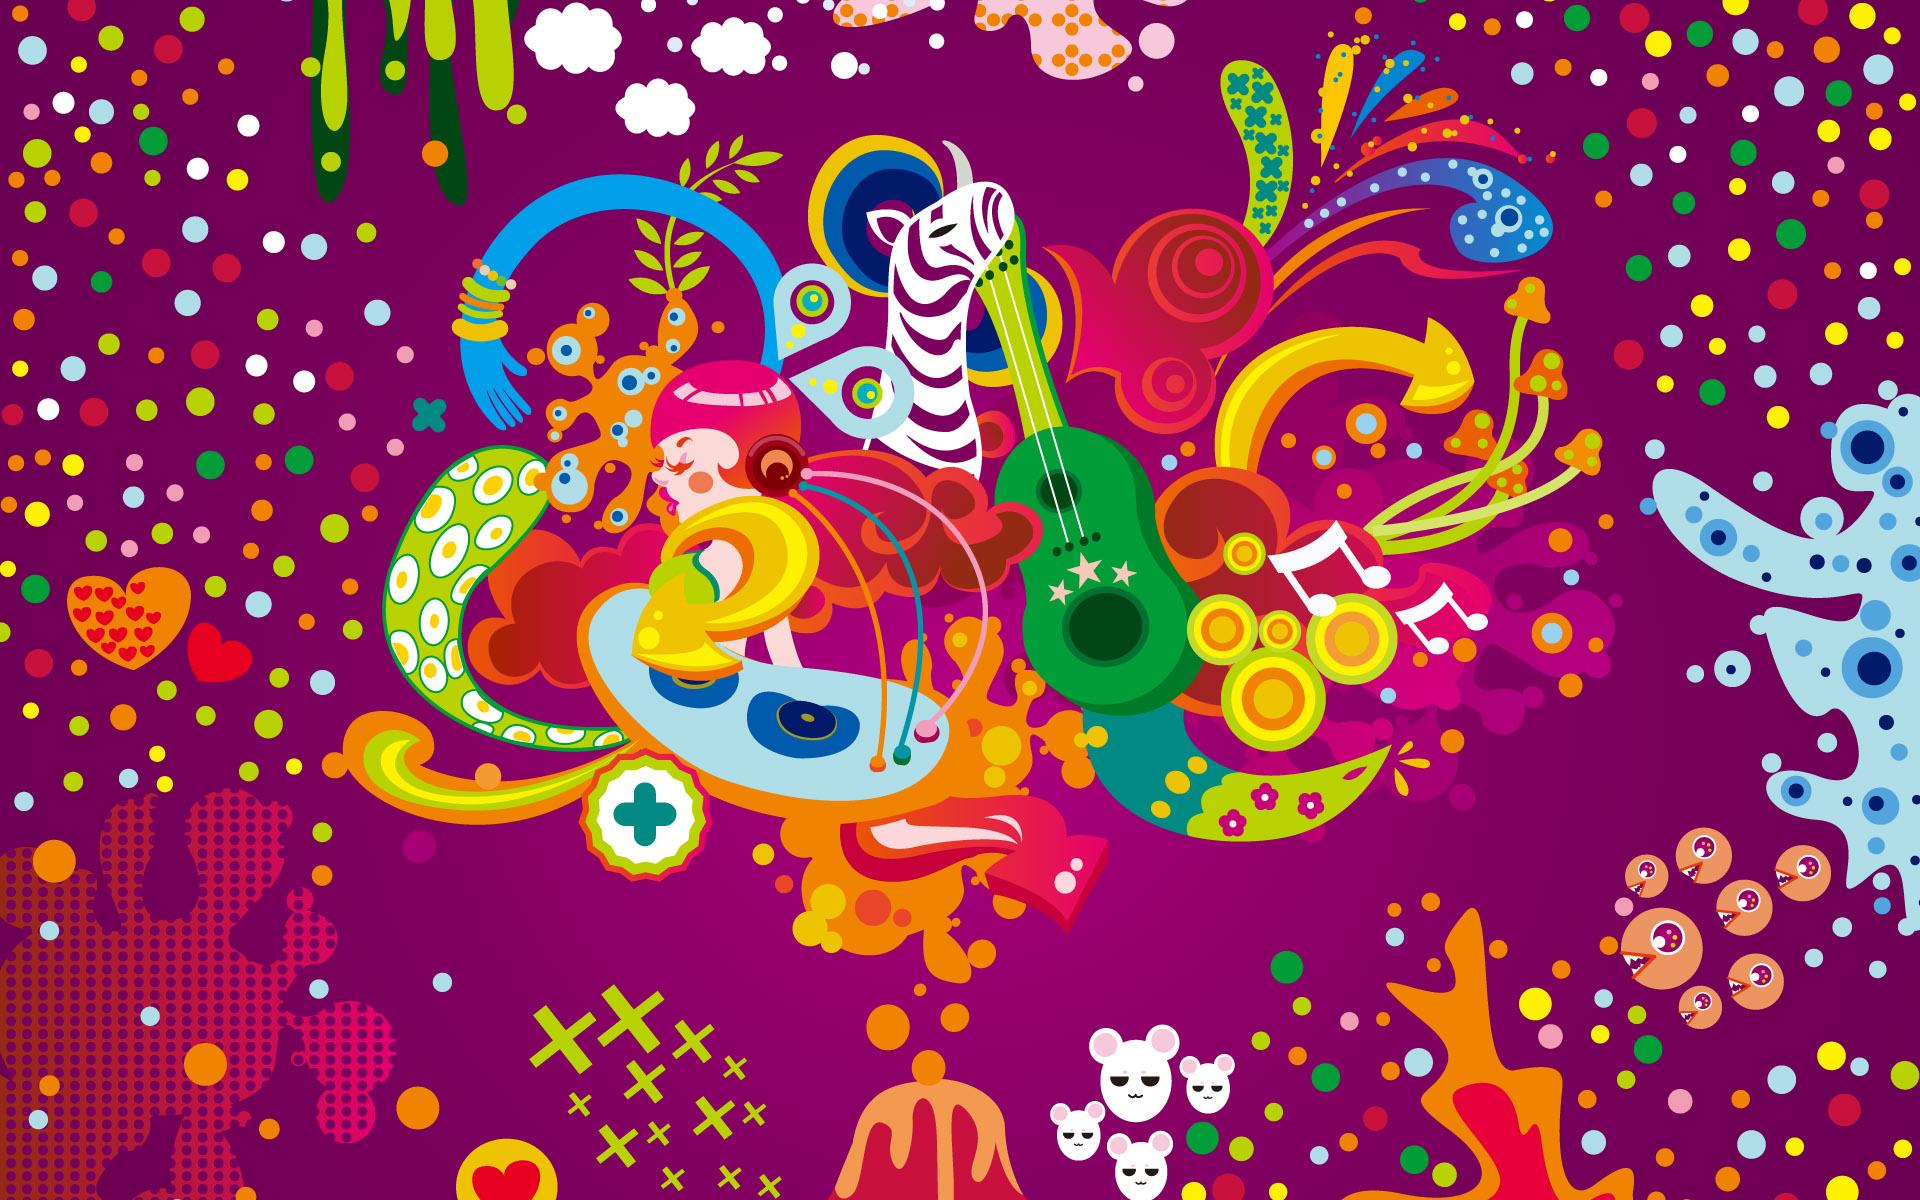 Colorful Vector Backgrounds HD Desktop Wallpaper HD Desktop 1920x1200